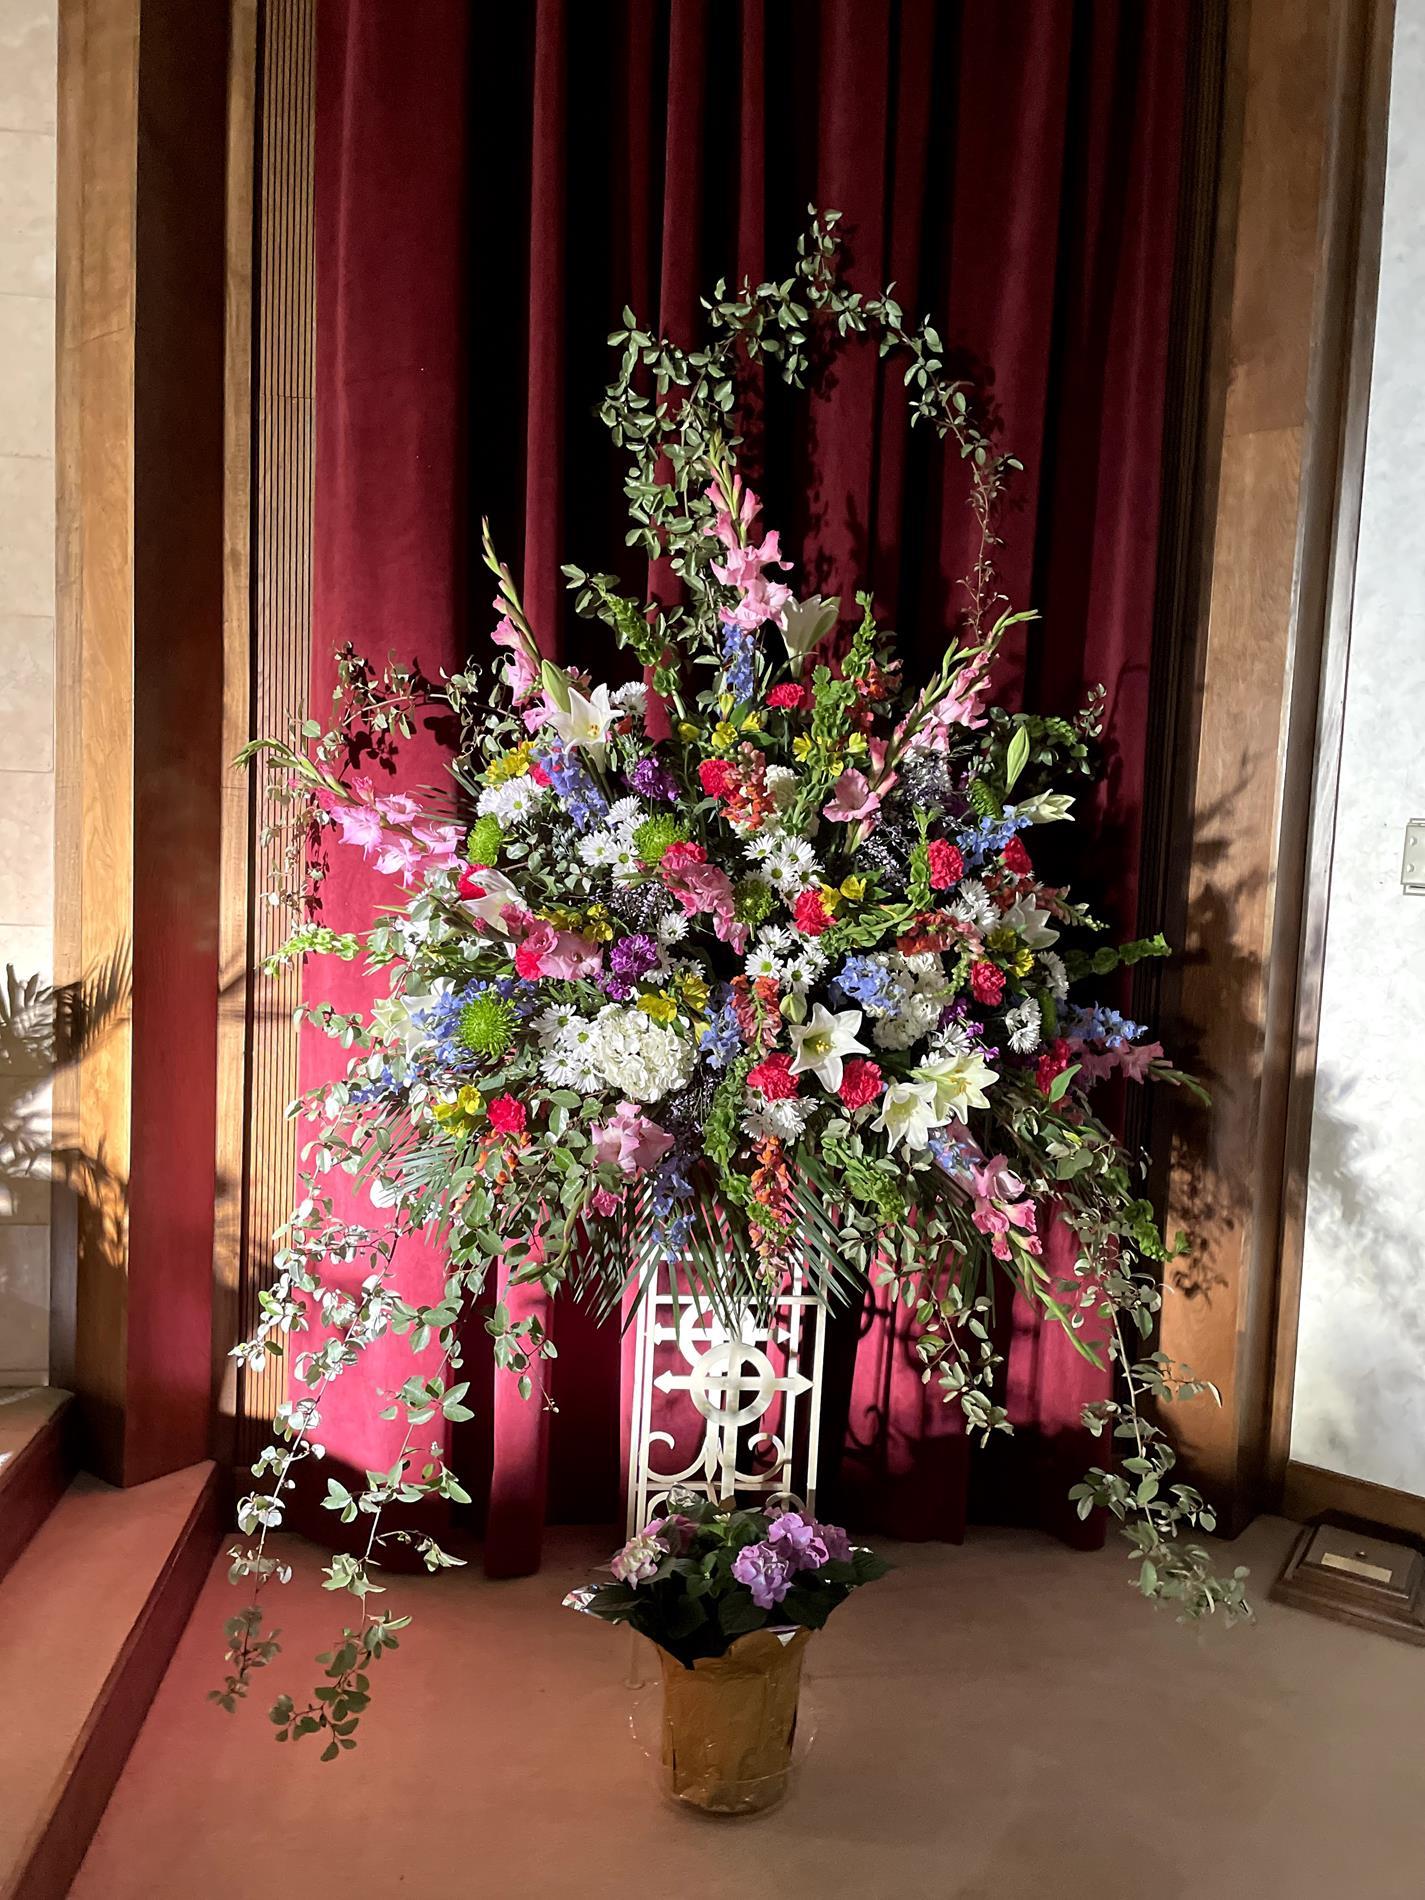 Beautiful arrangements by Lisa Smith!